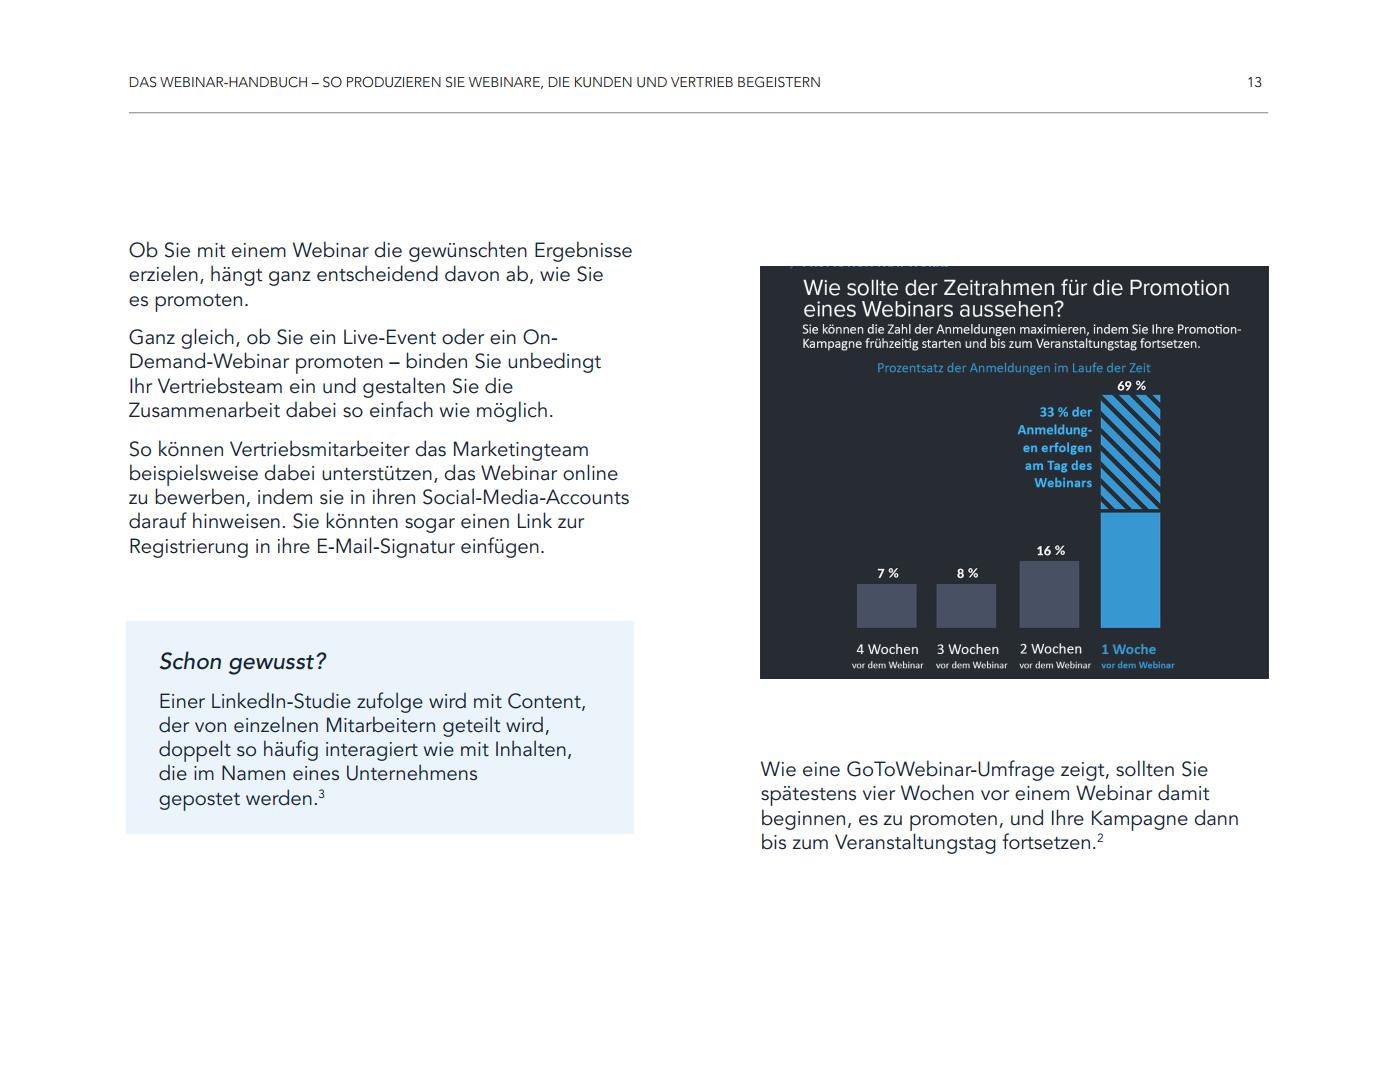 Das Webinar-Handbuch – GoToWebinar & HubSpot – Vorschaubild 5